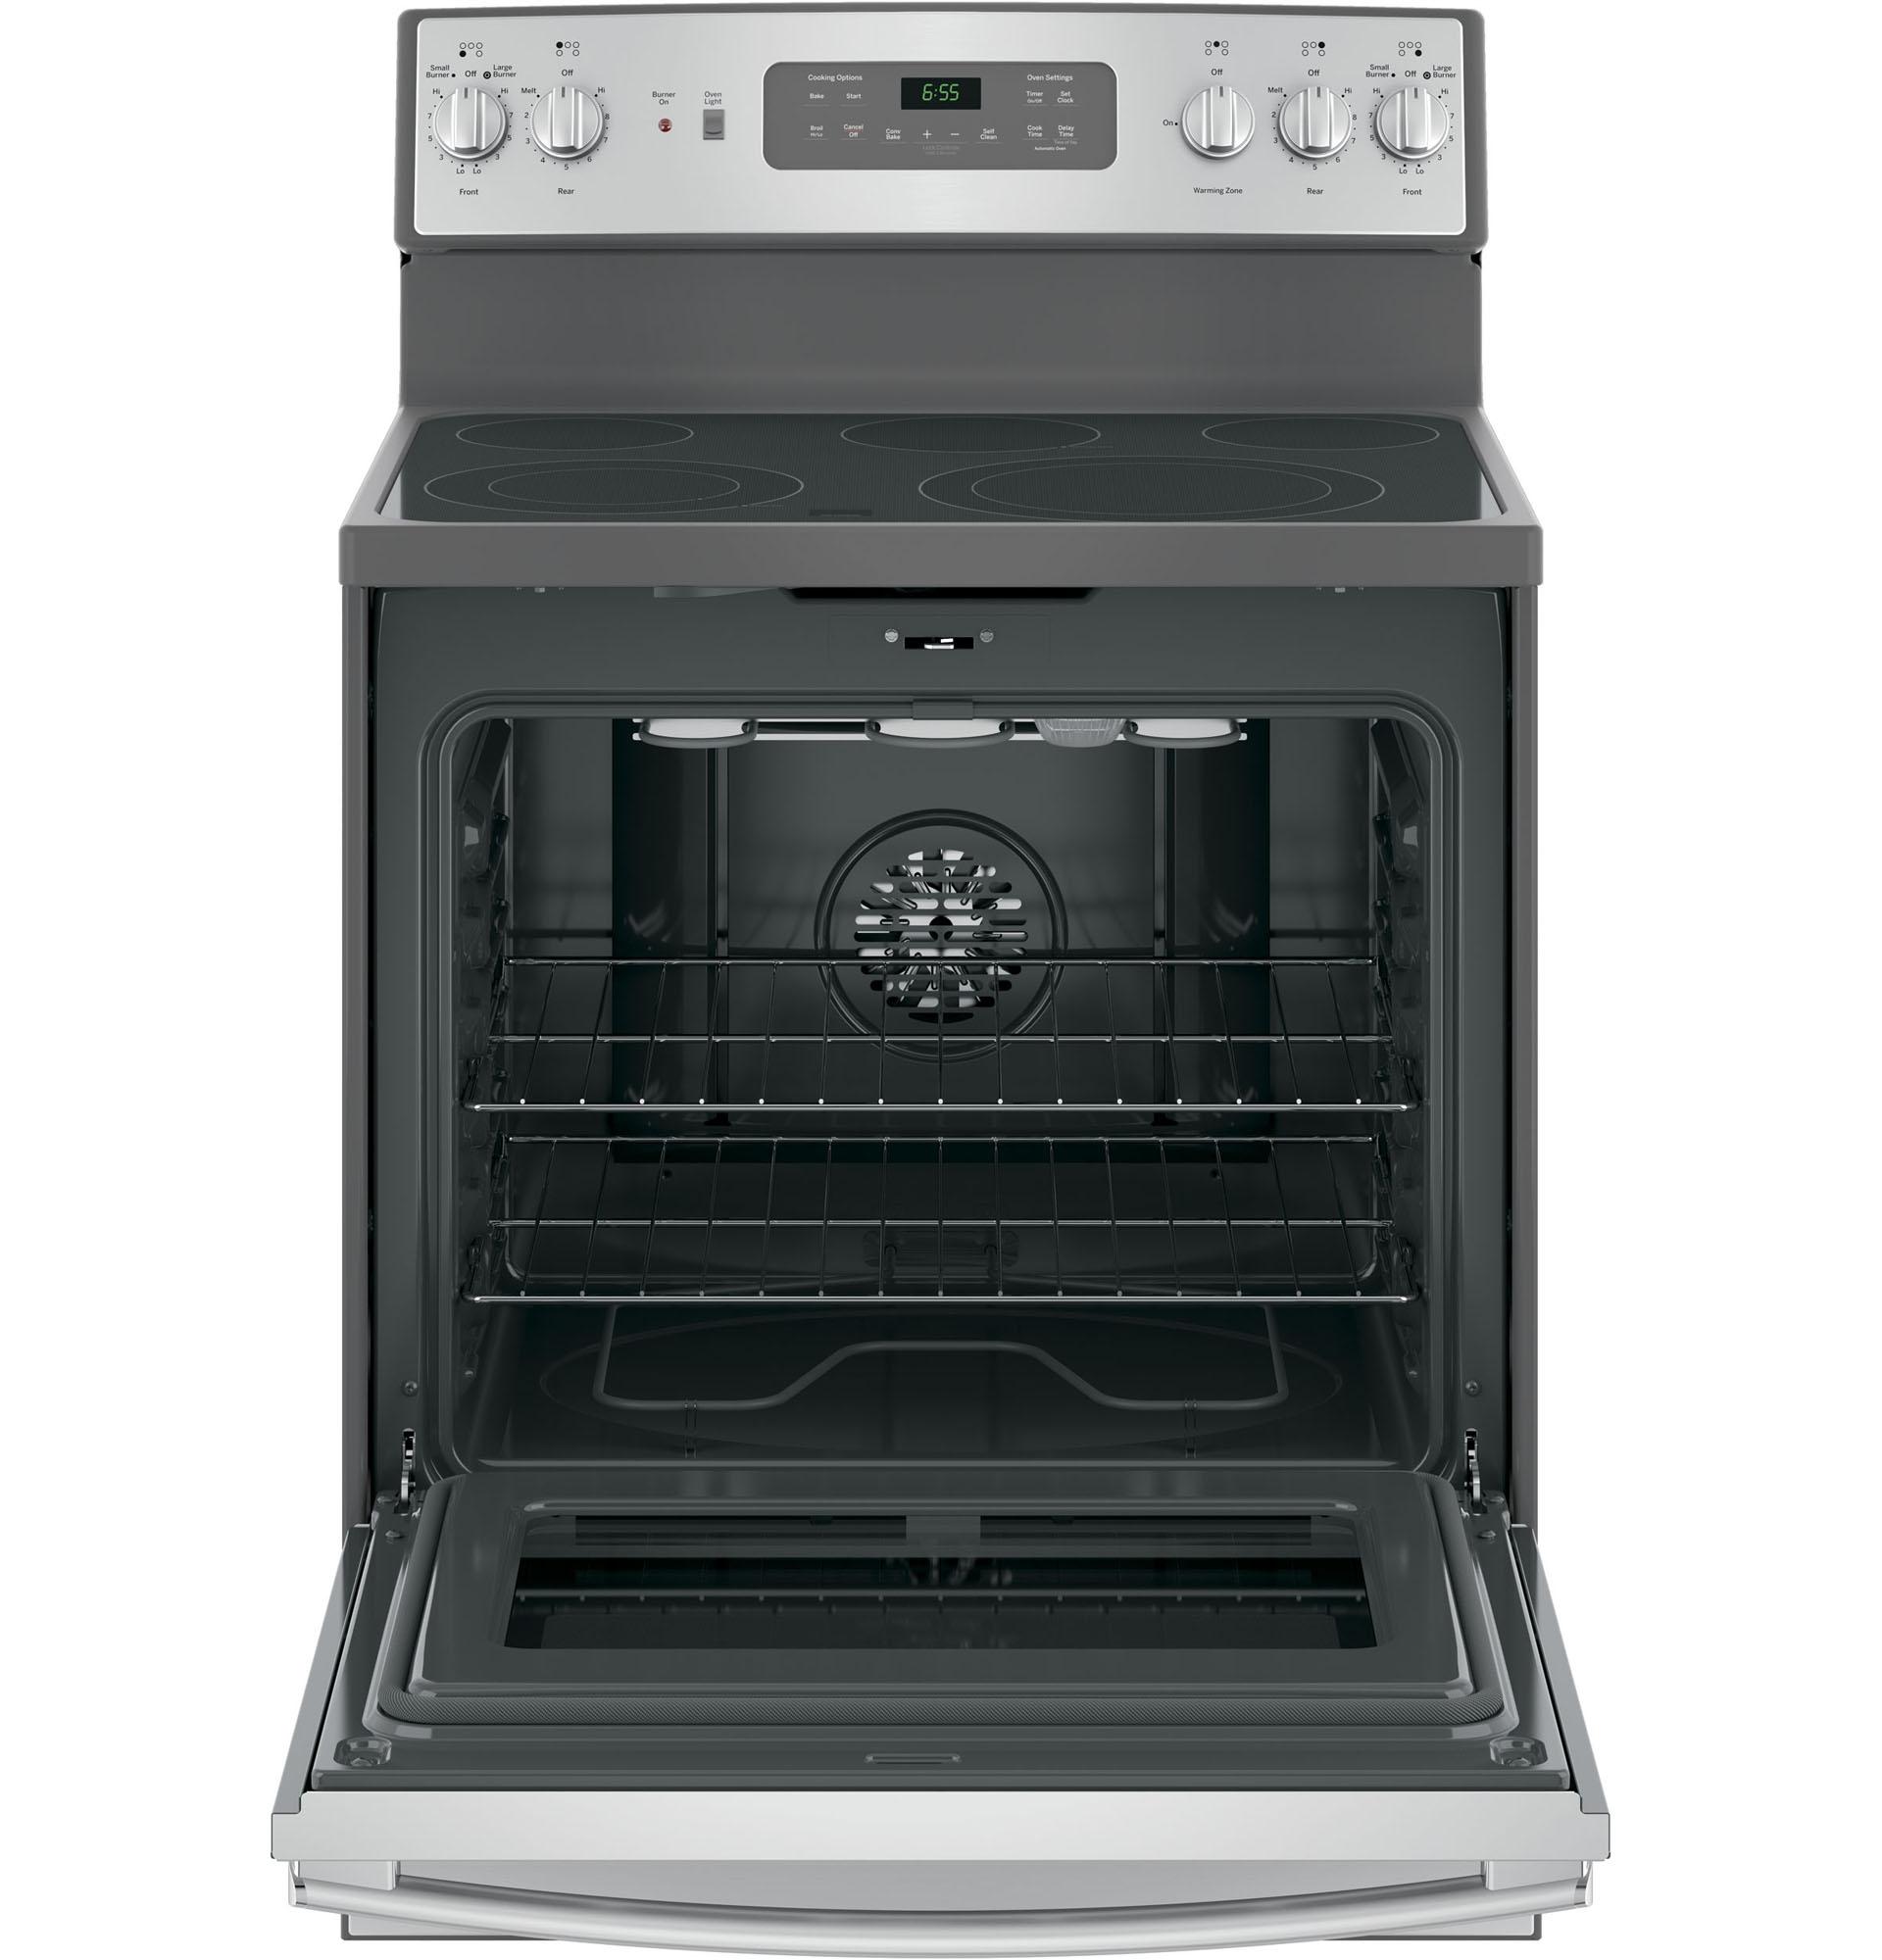 "GE Appliances JB655SKSS 30"" Freestanding Electric Range - Stainless Steel"